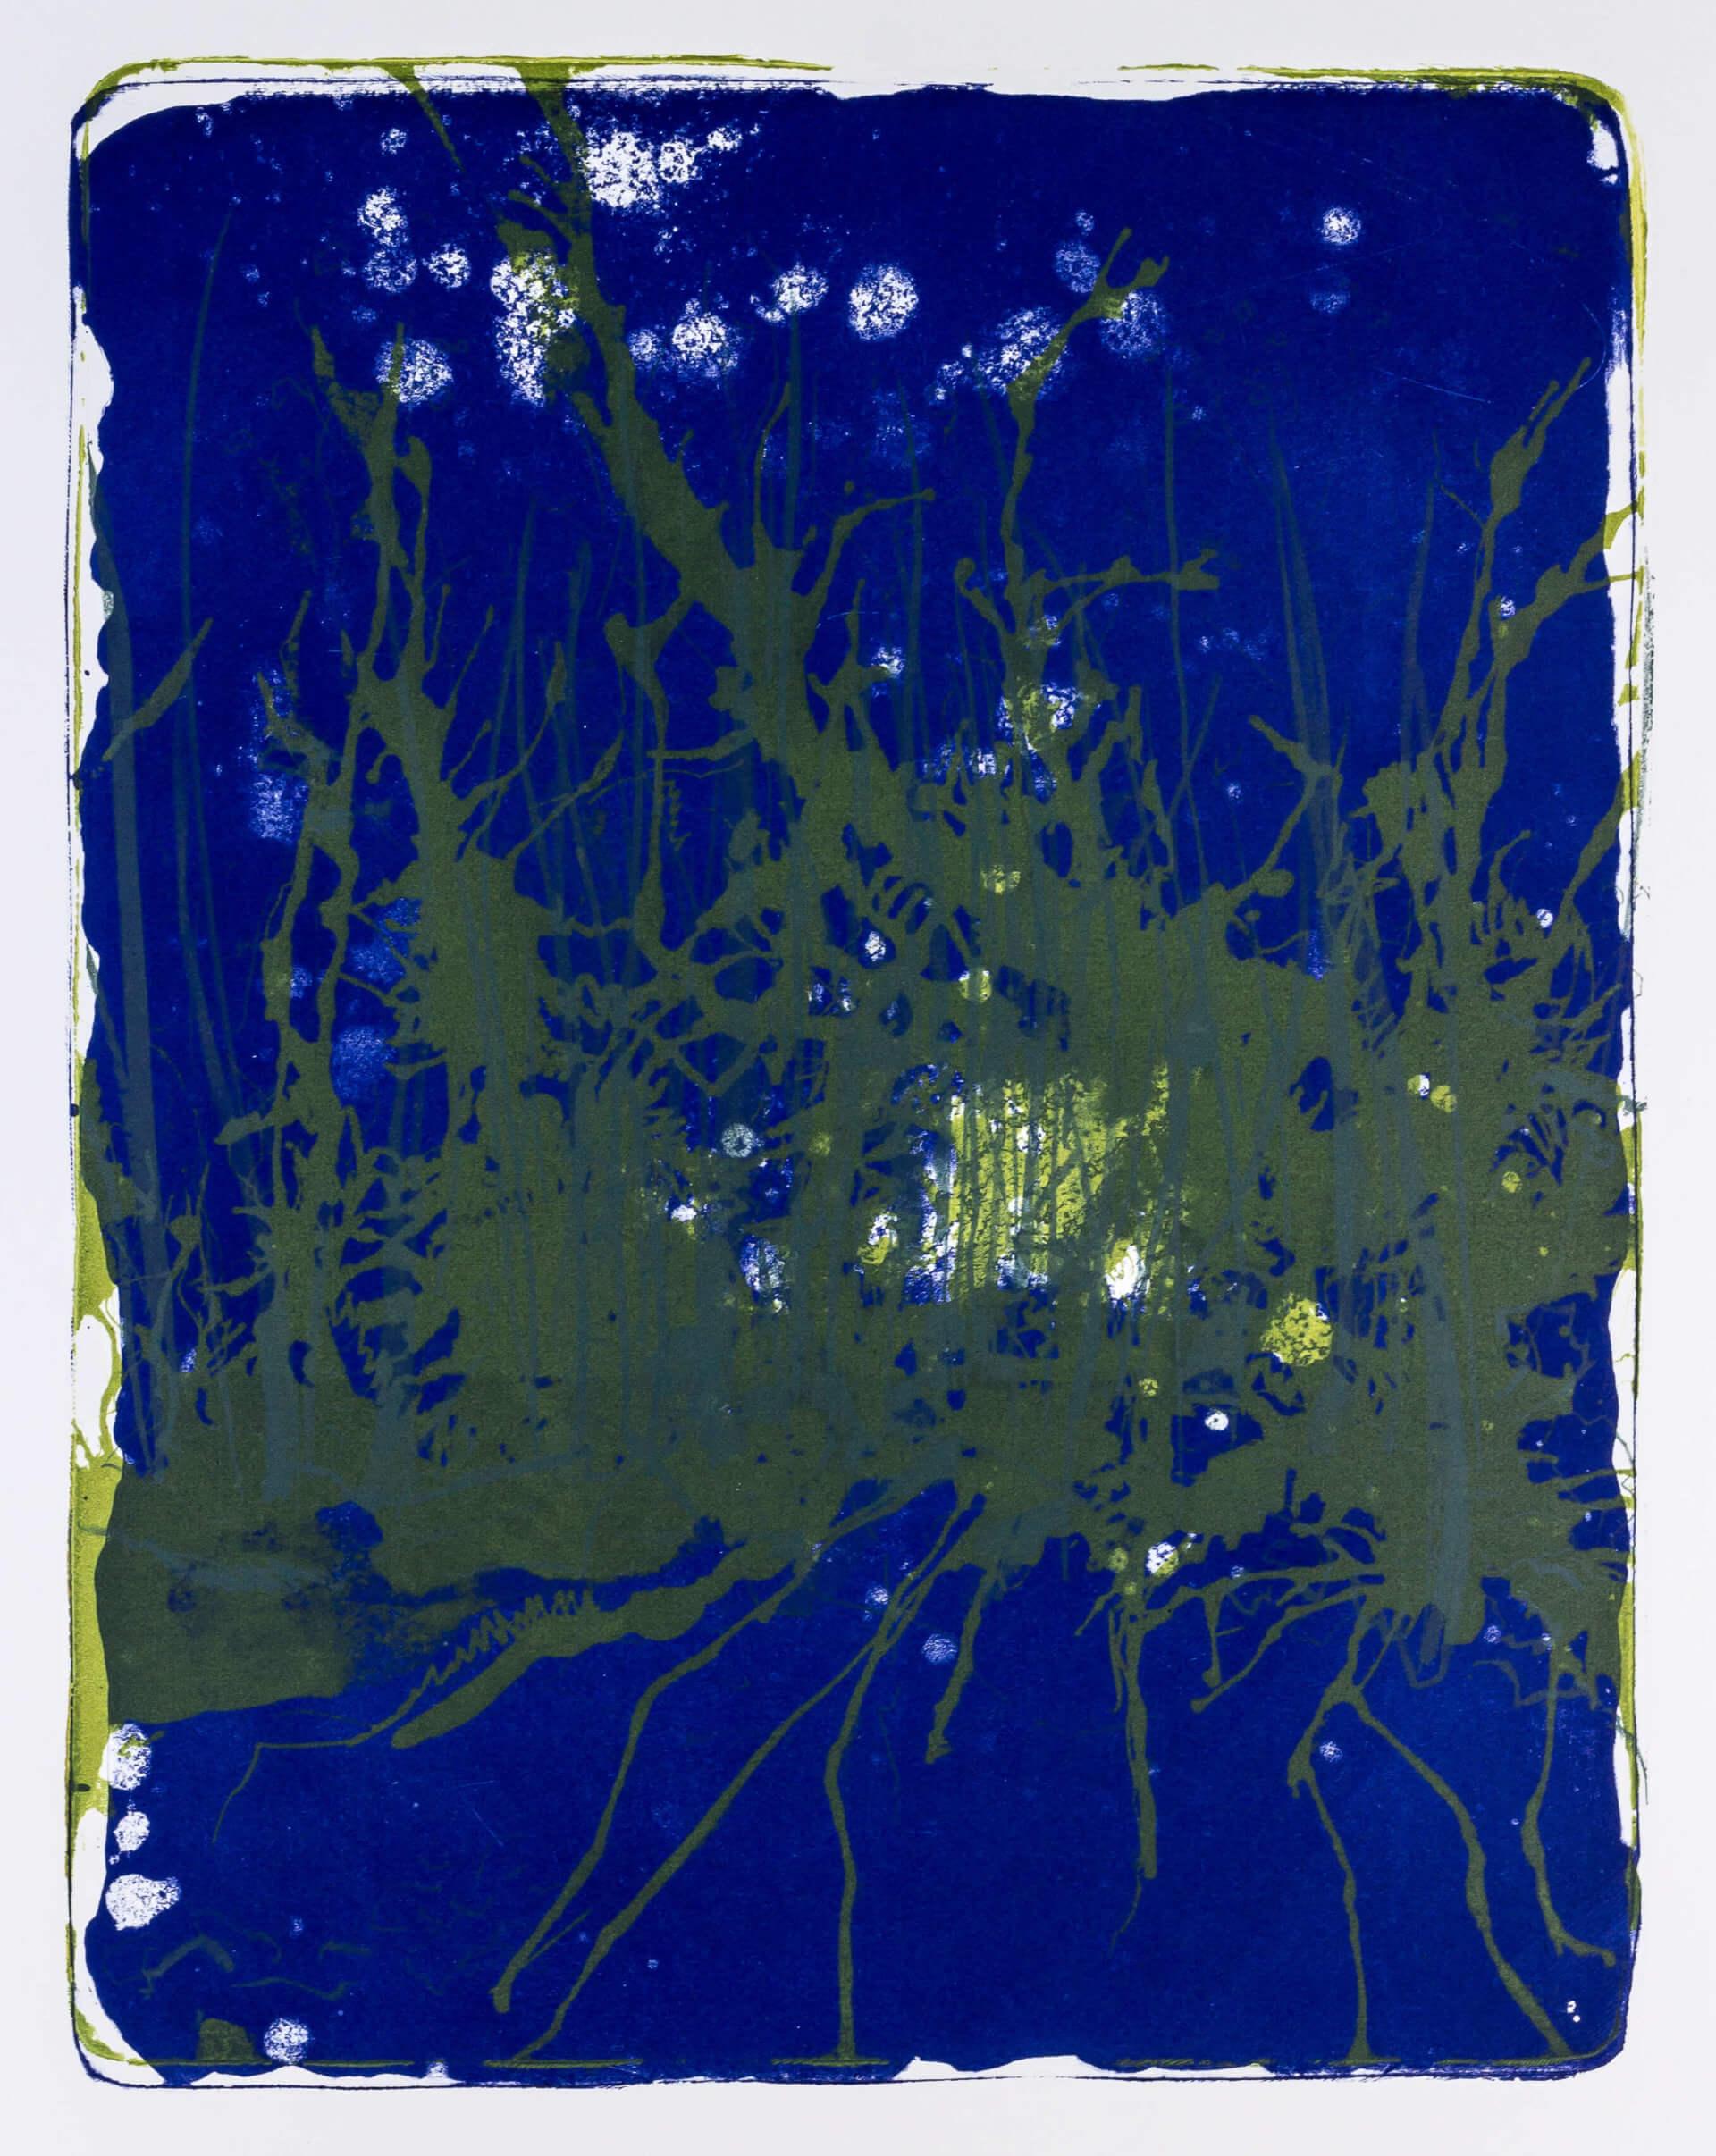 Katharina Albers, Wald X-XXIV, 2015, Farblithographie, Unikat, 50×40 cm